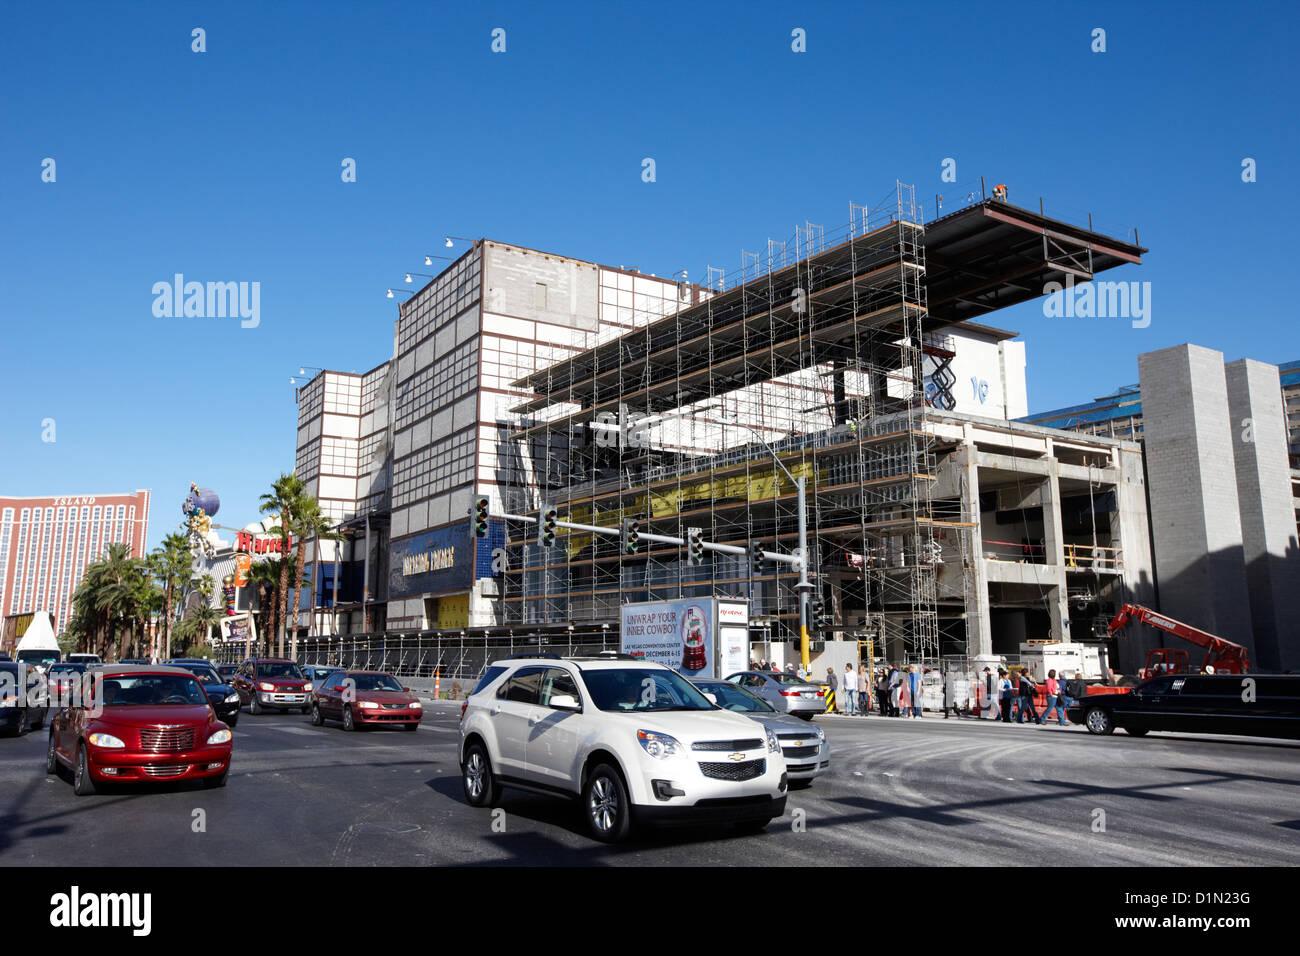 redevelopment of the imperial palace casino Las Vegas Nevada USA - Stock Image